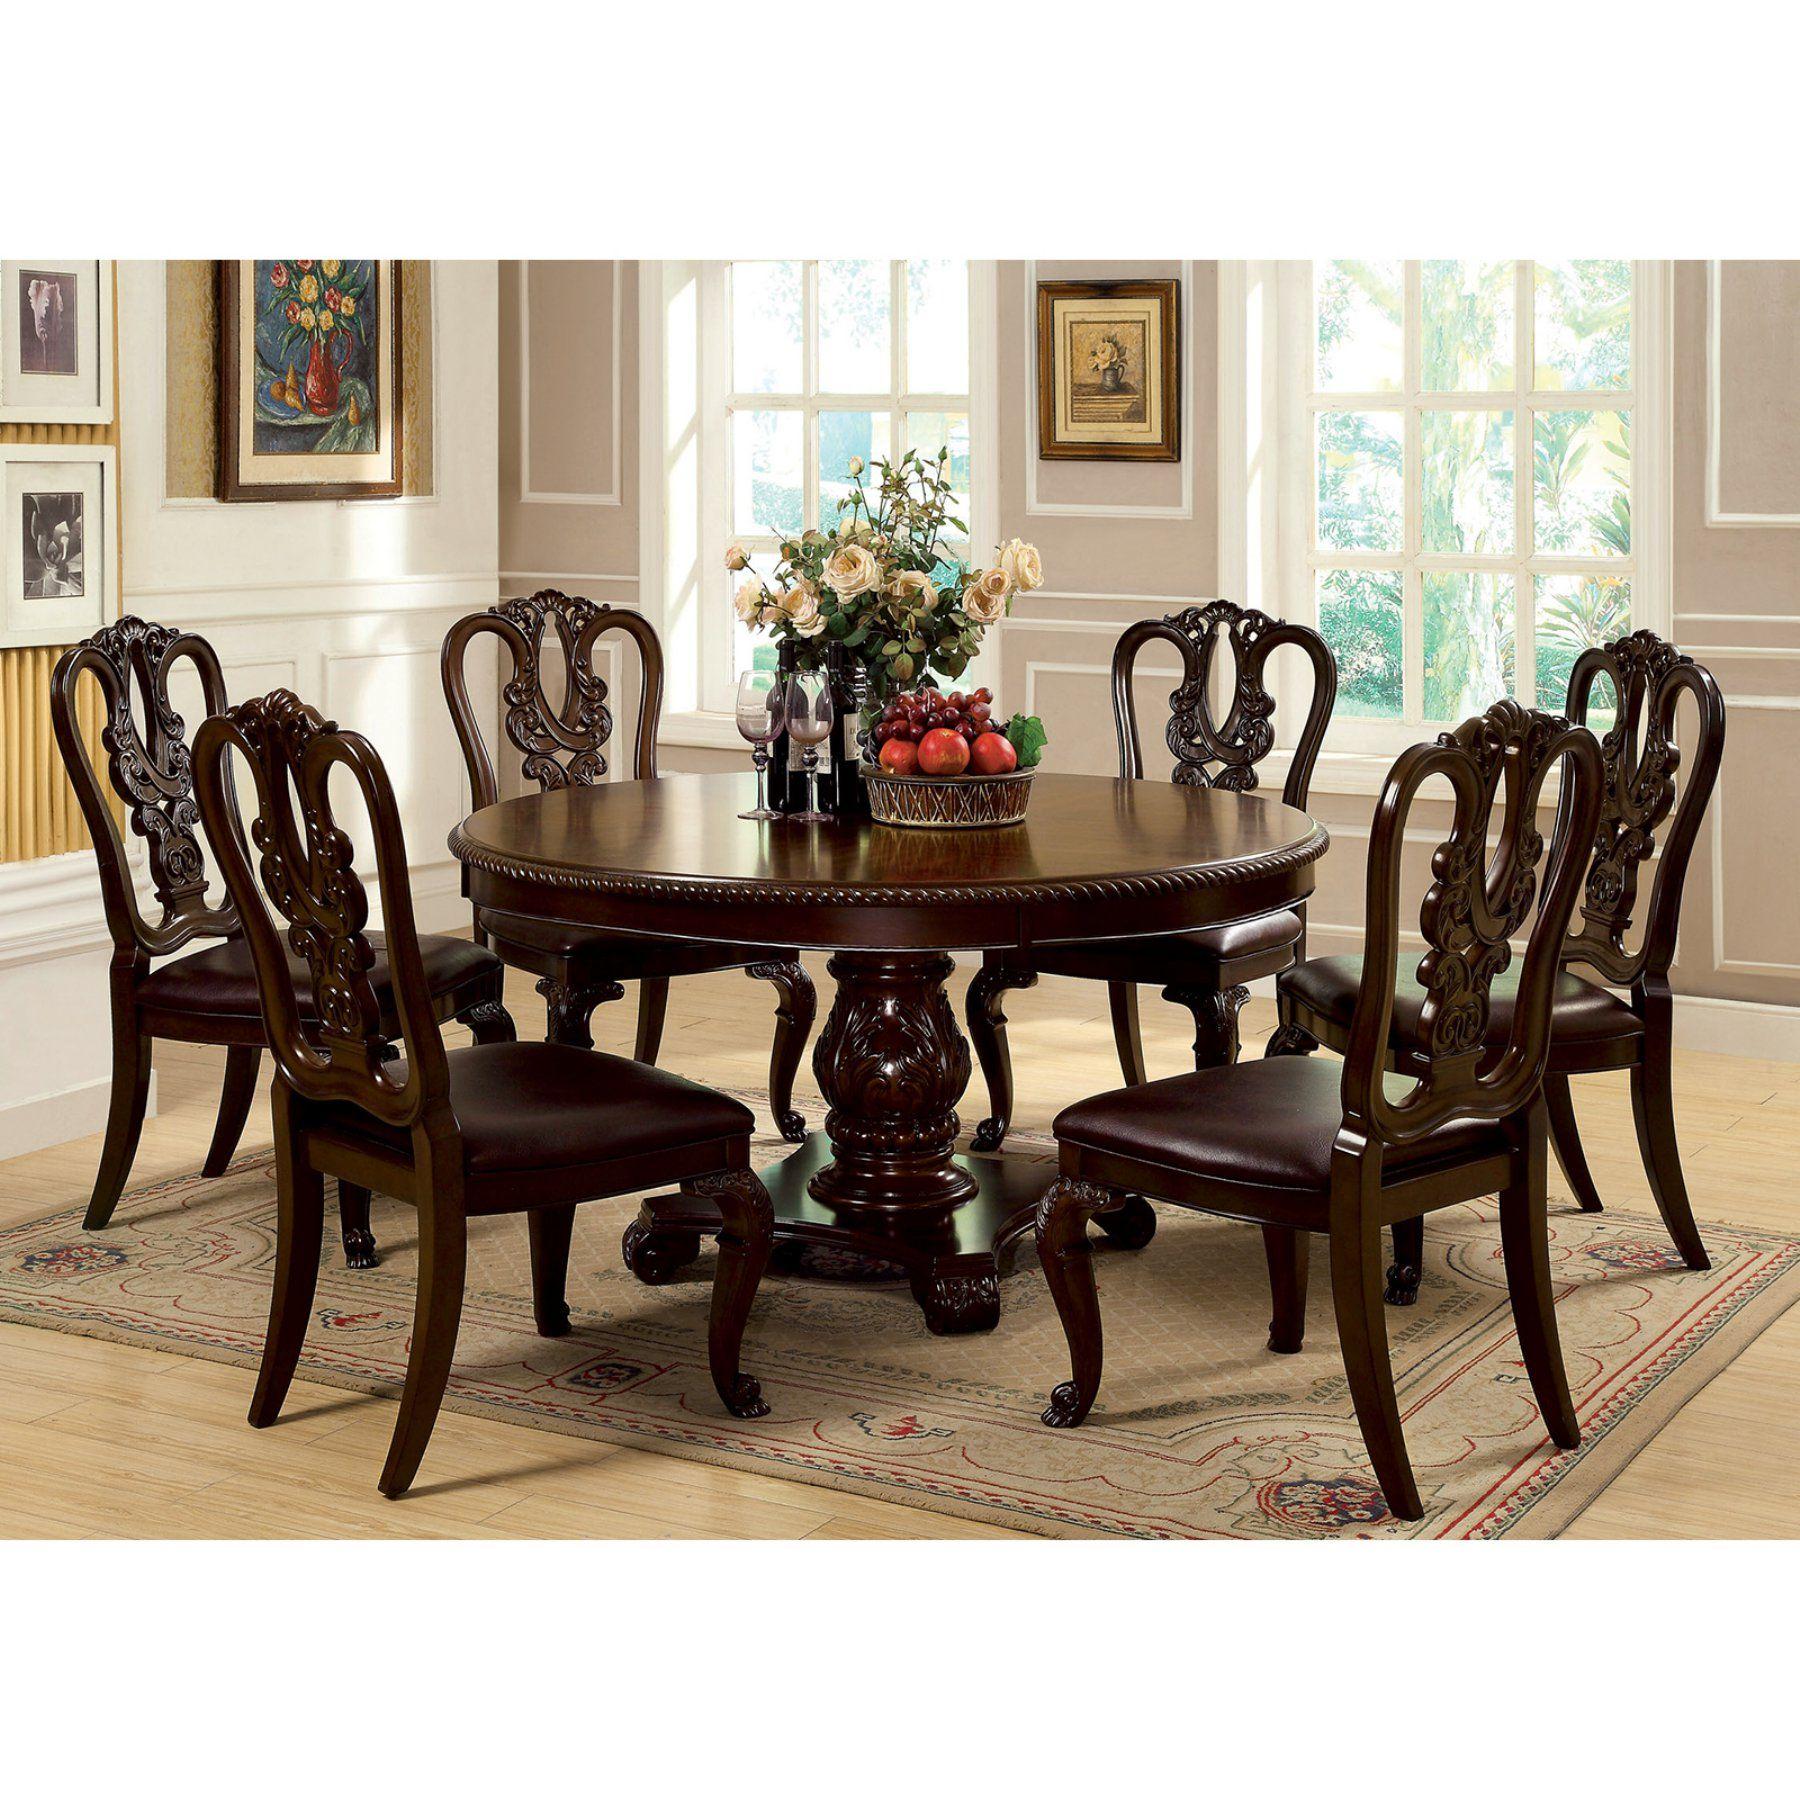 Furniture Of America Berkshire 7Piece Round Dining Set With Amusing 7 Piece Round Dining Room Set Inspiration